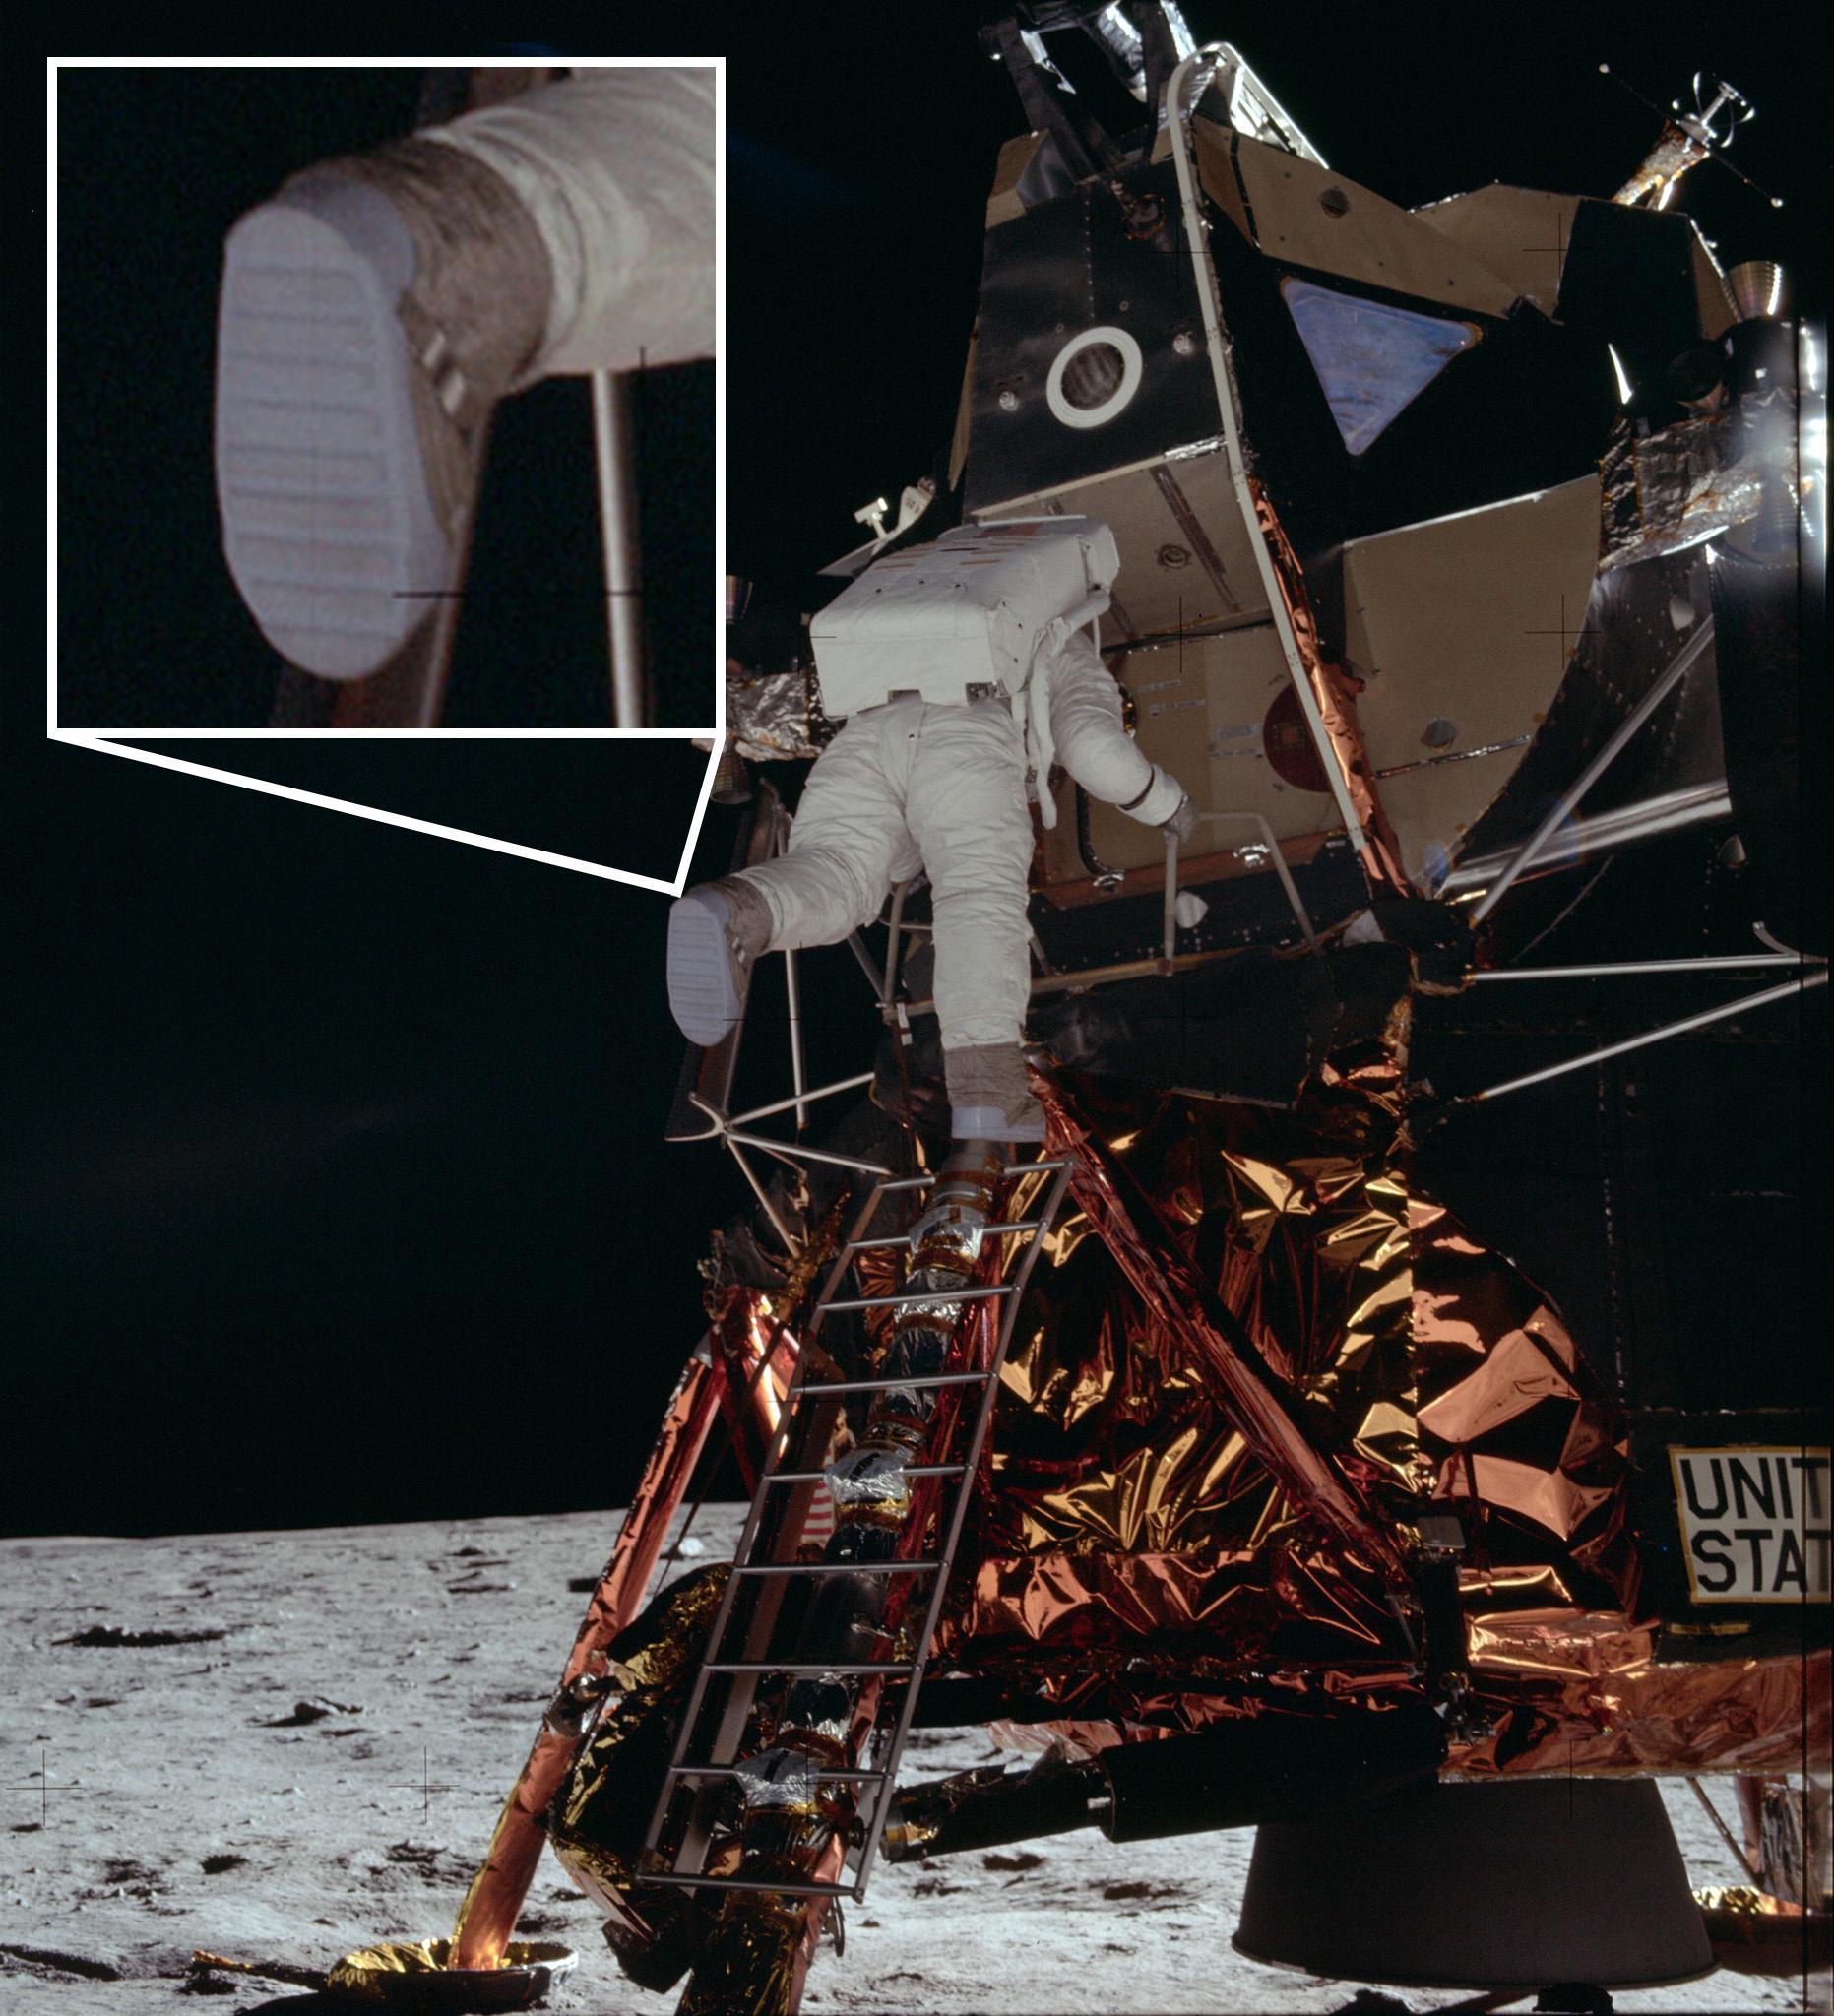 Apollo 11 moon landing: How conspiracy theories that began